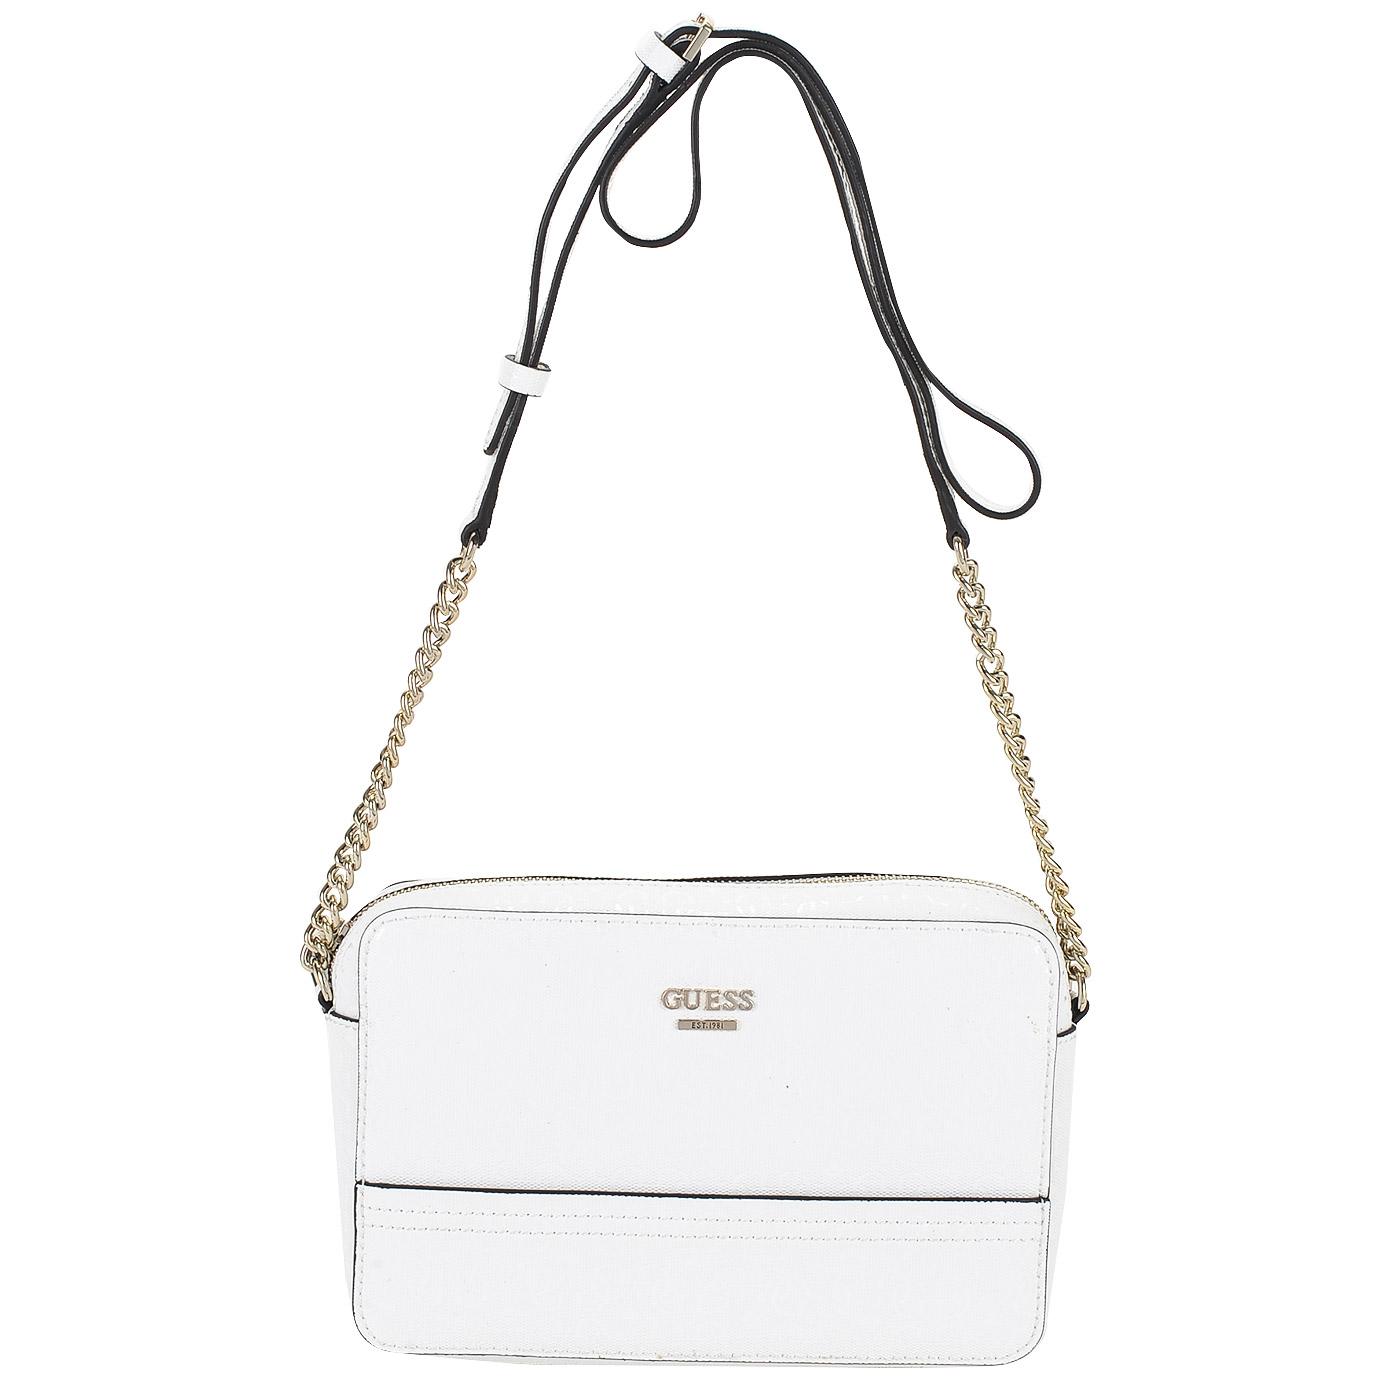 7d8828c36ac6 Женская белая сумка через плечо Guess Devyn HWGS64 21120_white ...